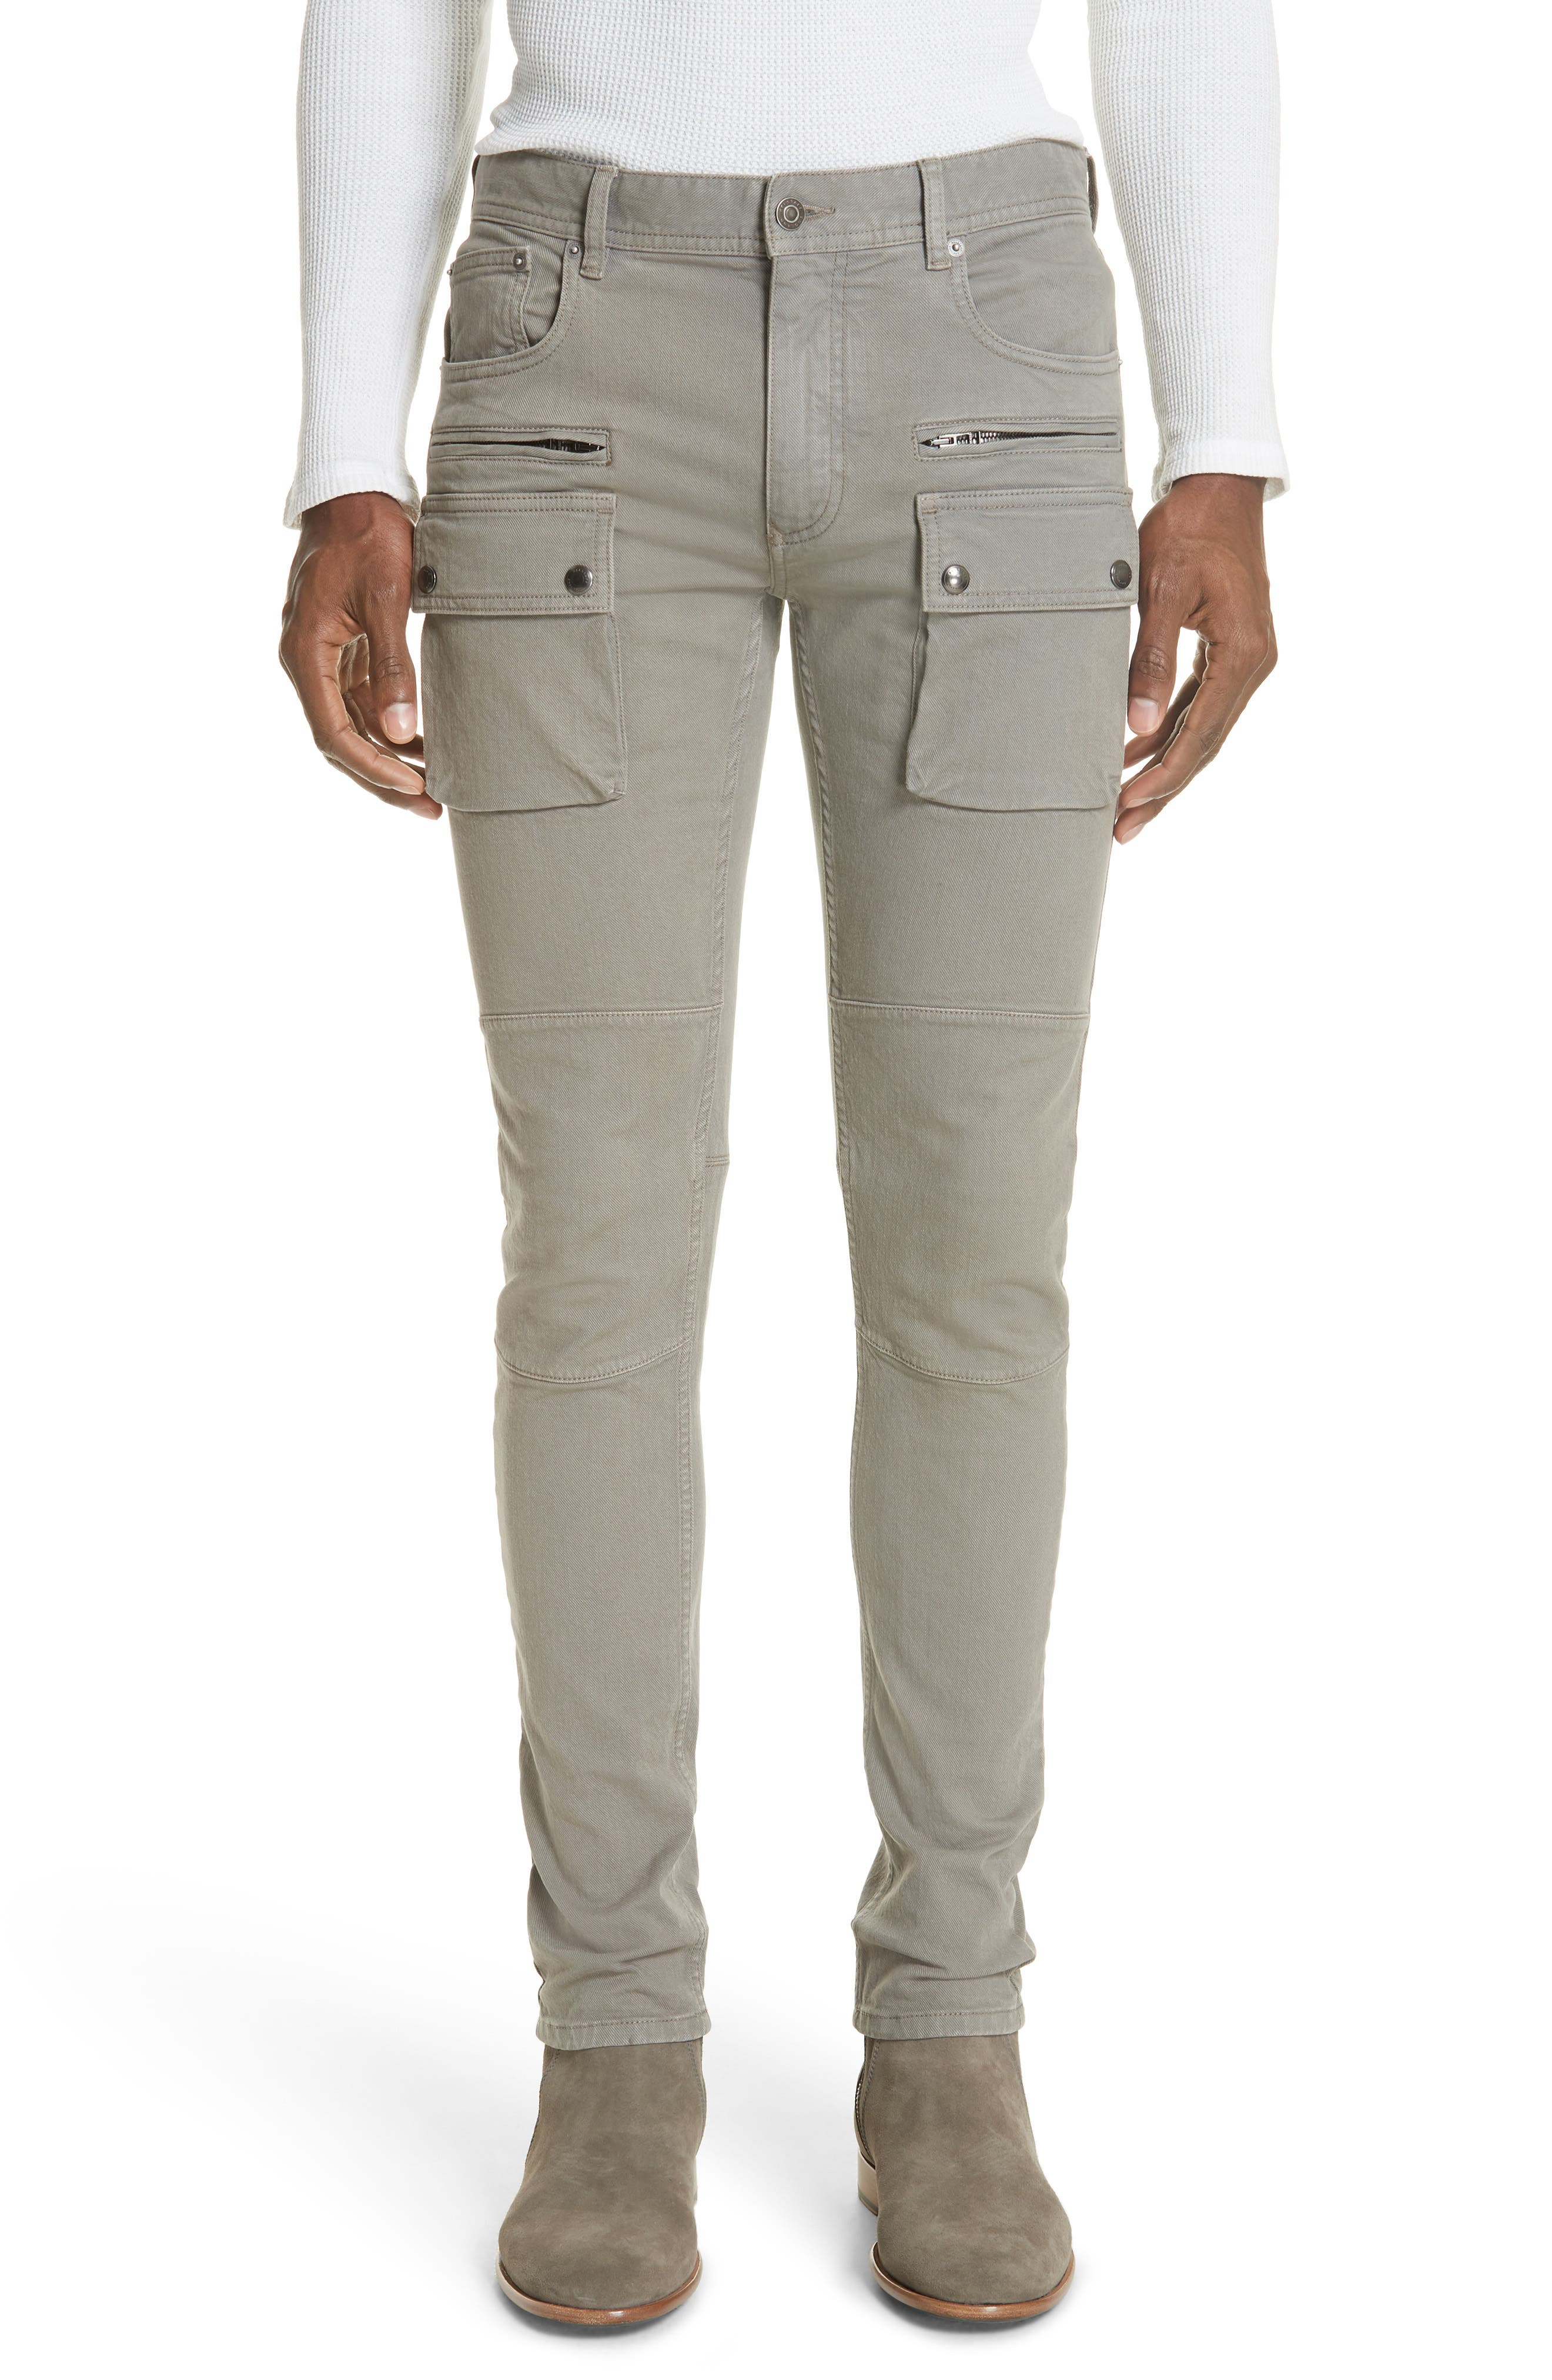 BELSTAFF Men'S Polmont Garment-Dyed Denim Skinny Cargo Jeans in Smoke Grey